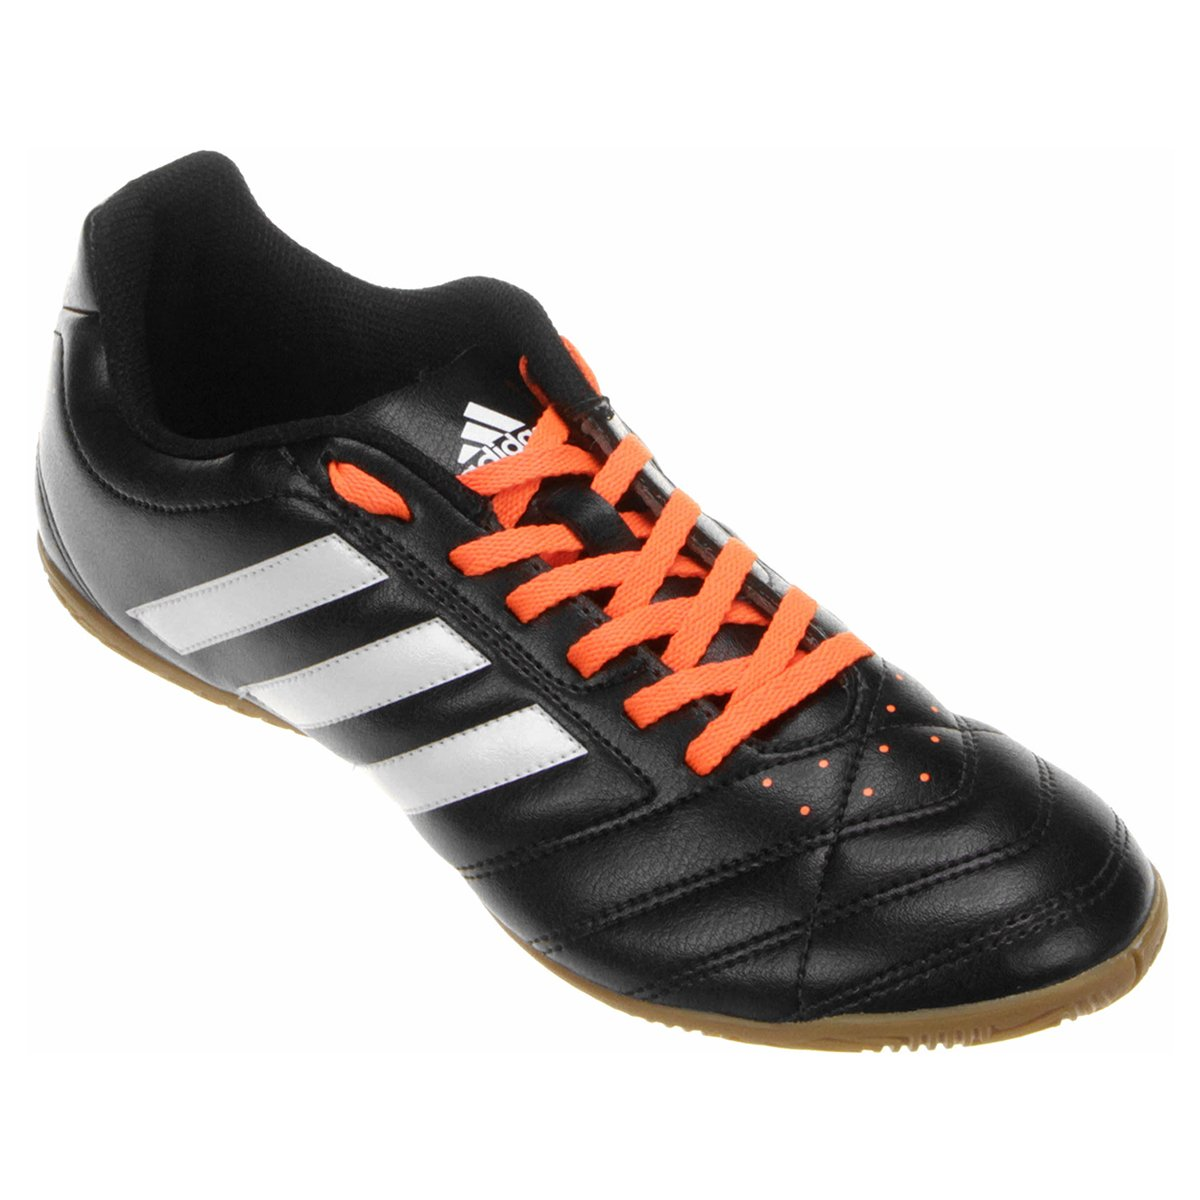 Chuteira Futsal Adidas Goletto 5 IN Masculina - Compre Agora  6cd3a8836ab30